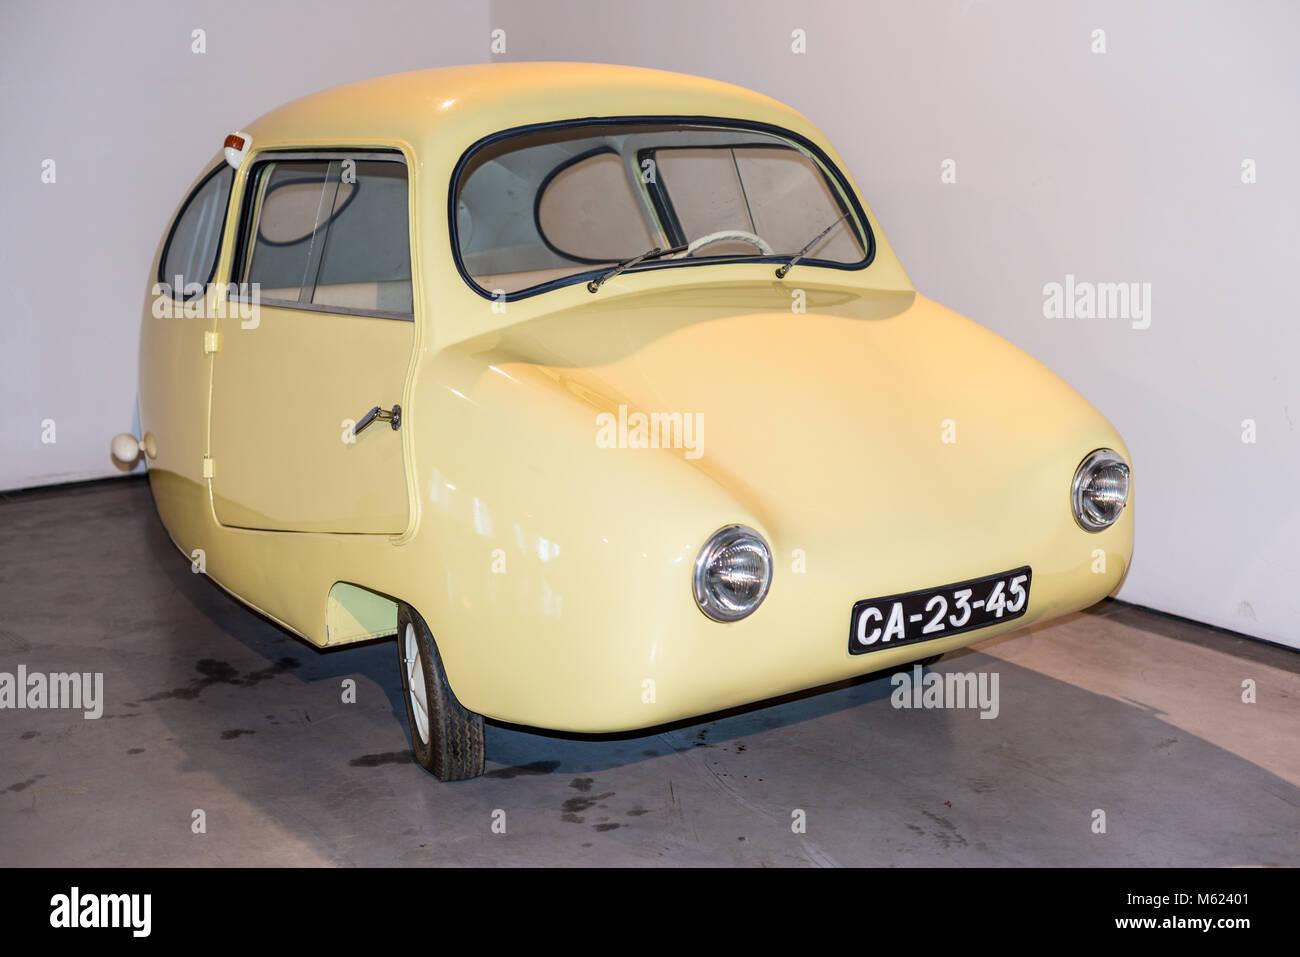 Malaga, Spain - December 7, 2016: The egg Fuldamobil car (model 1955) Germany displayed at Malaga Automobile and - Stock Image